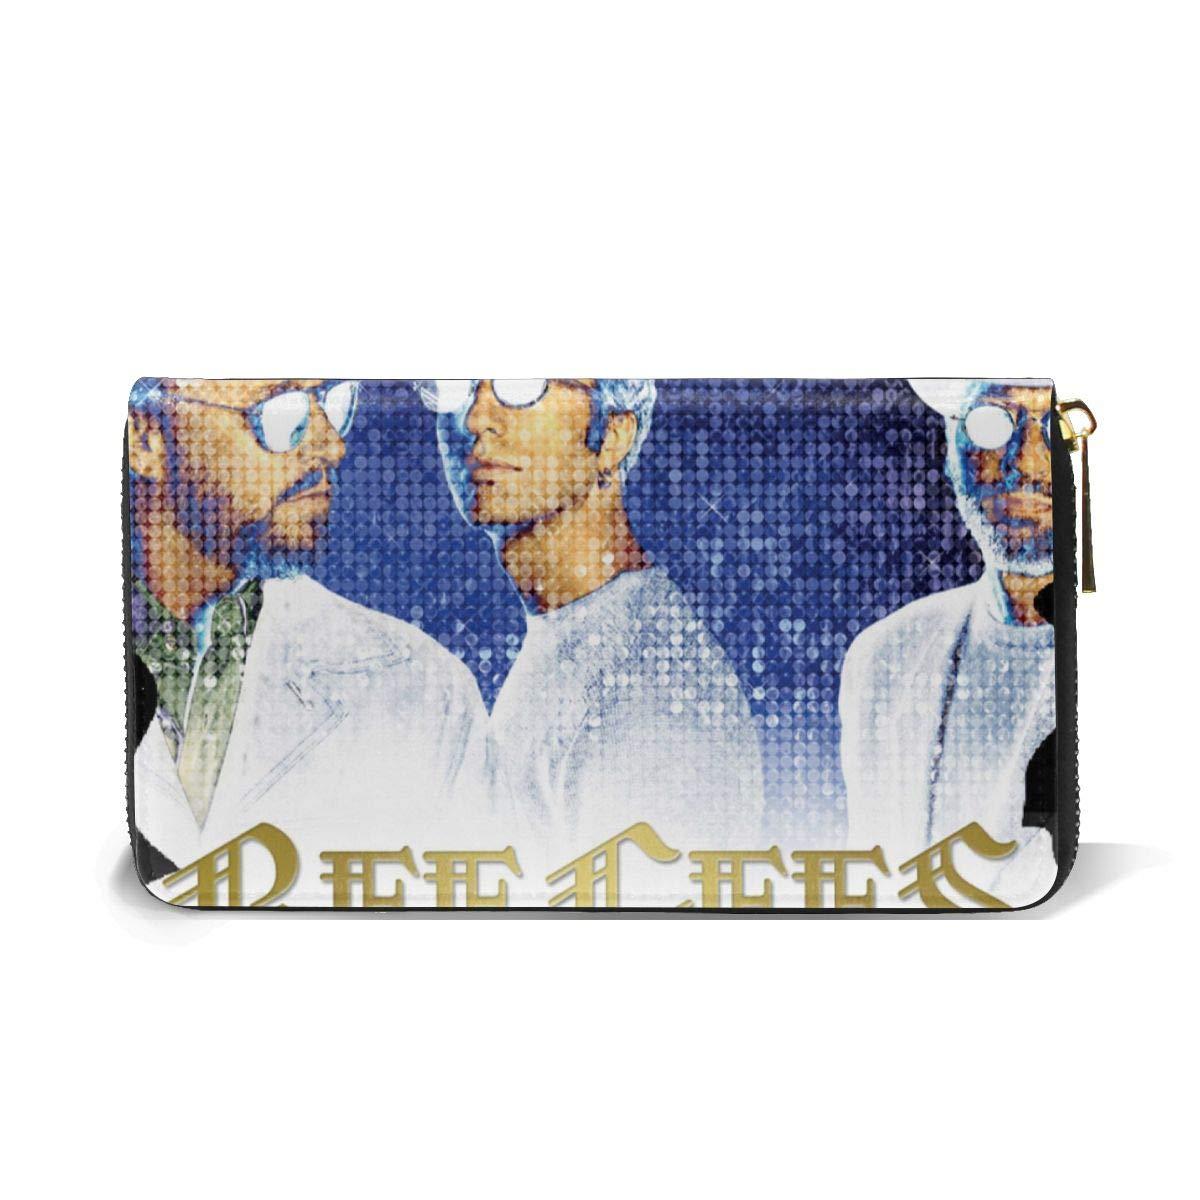 XJLGGMHDS Bee Gees Unisex Wallet Zipper Closure Card Slots Zippered Coin Pouch